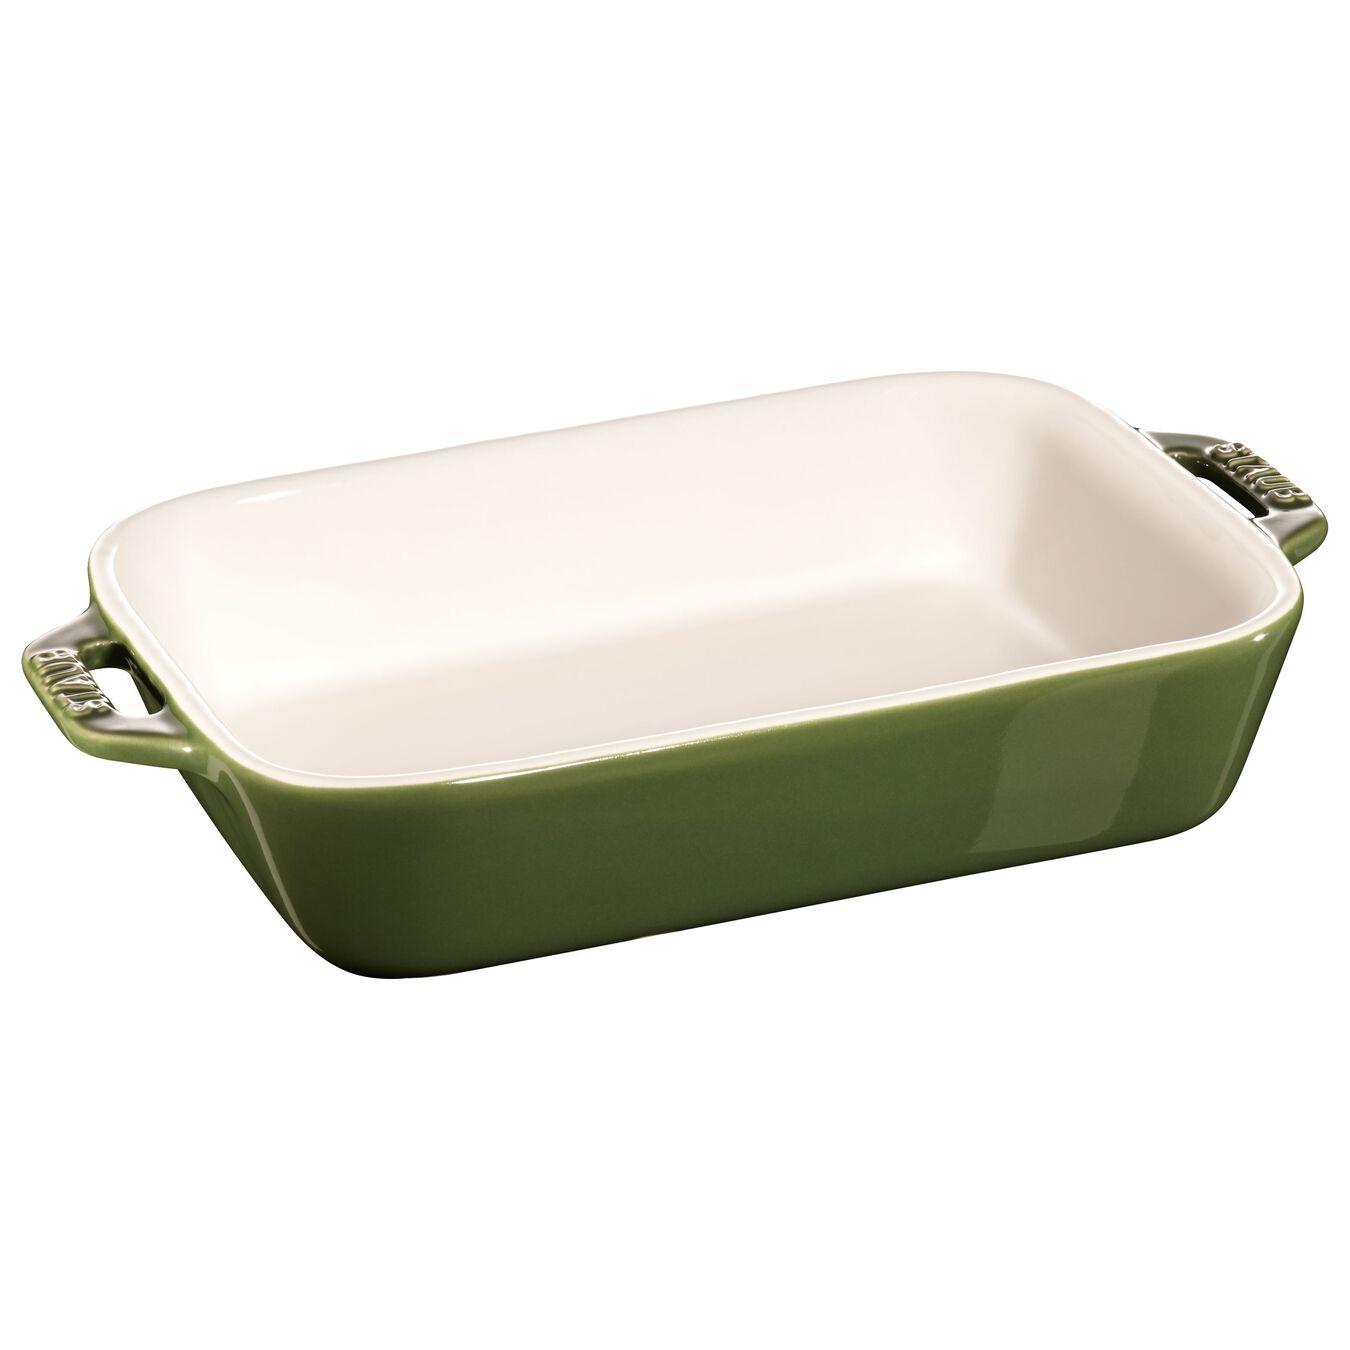 2 Piece rectangular Bakeware set, Basil-Green,,large 3